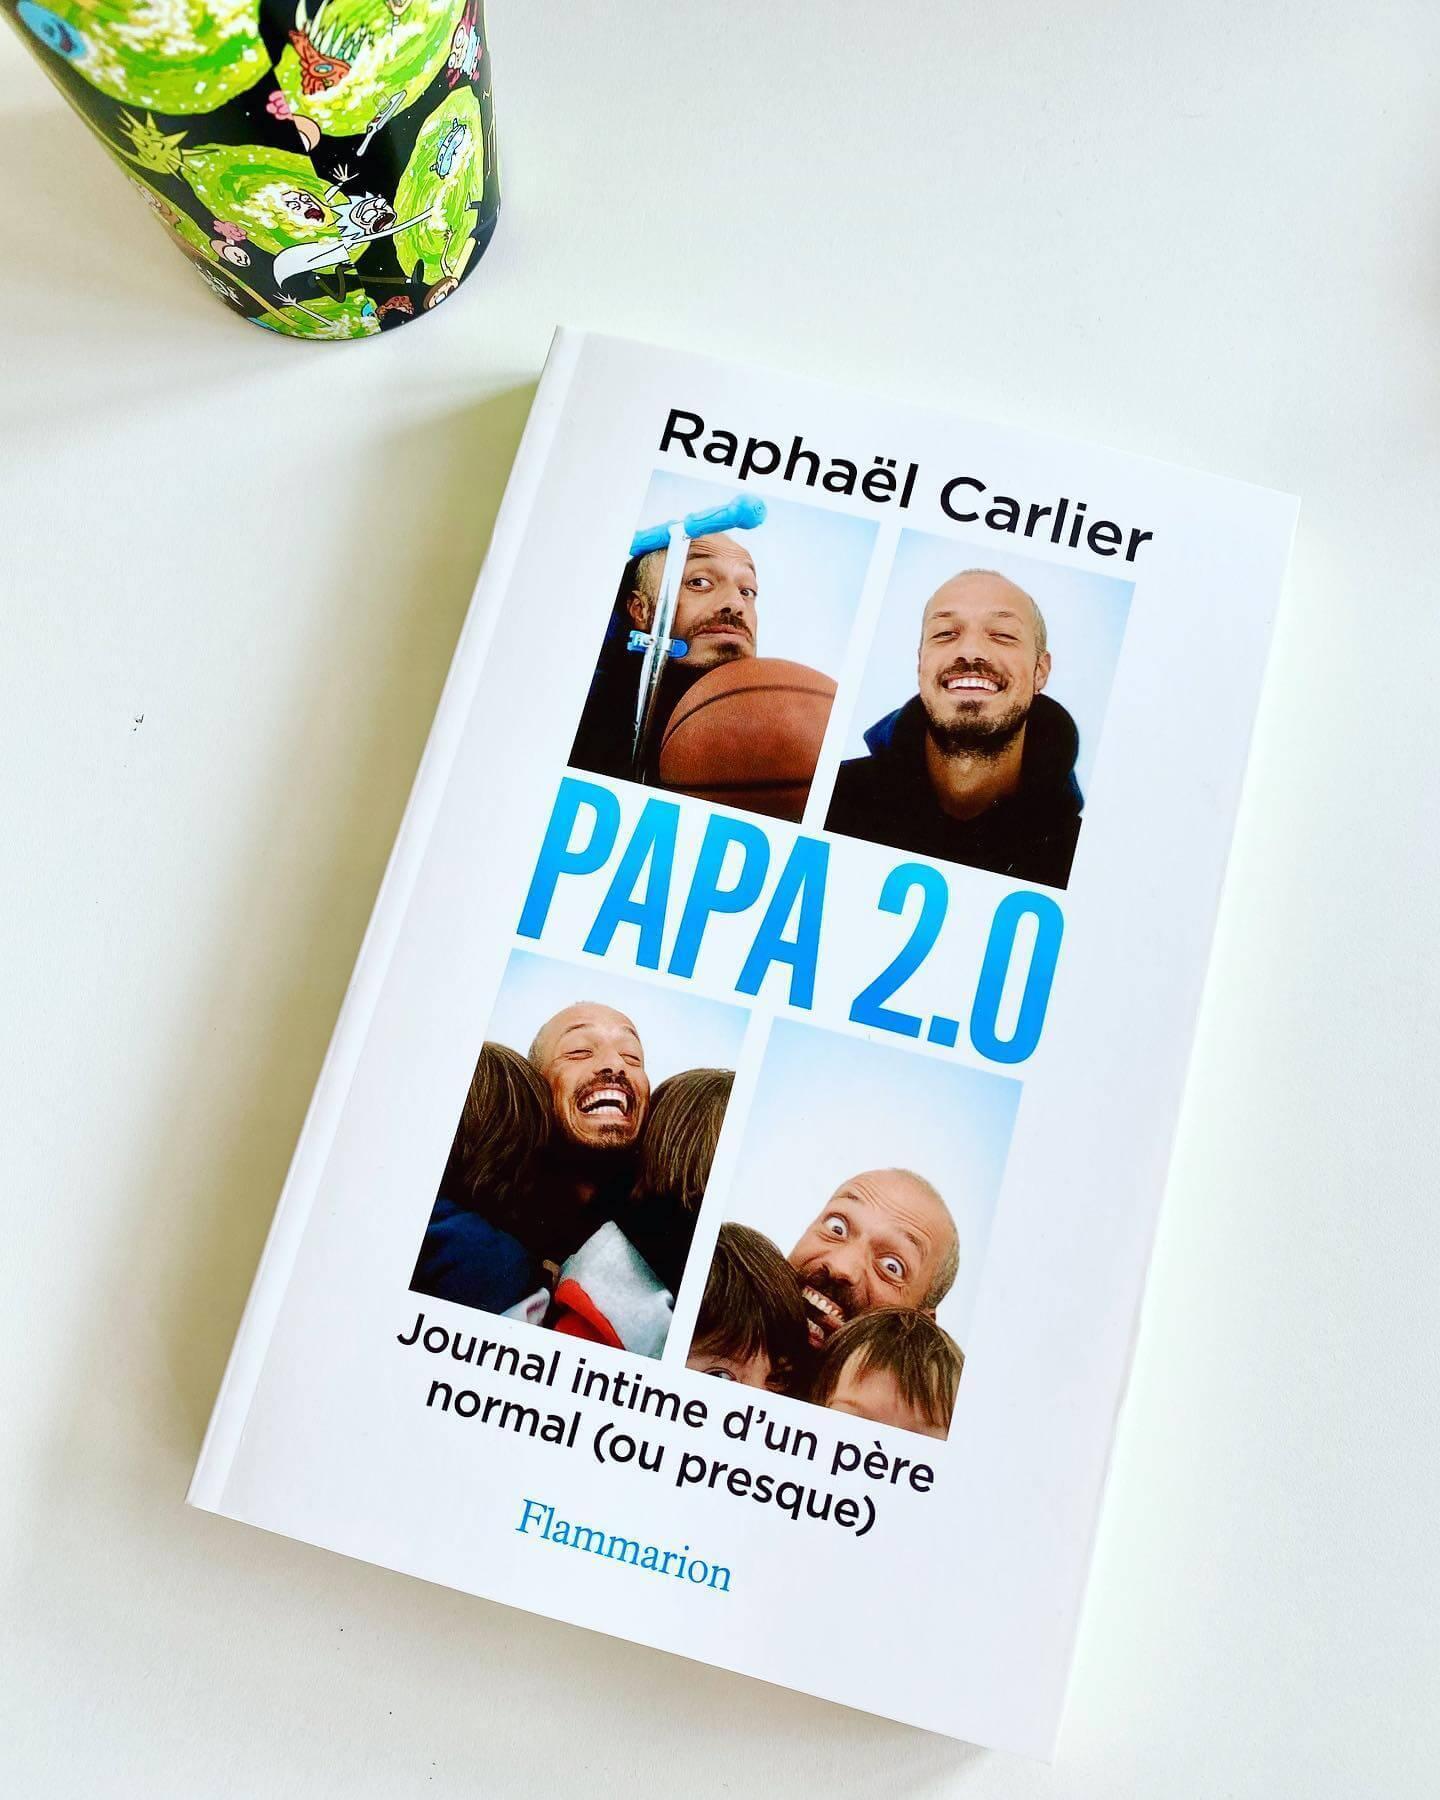 Raphaël Carlier - Papa 2.0